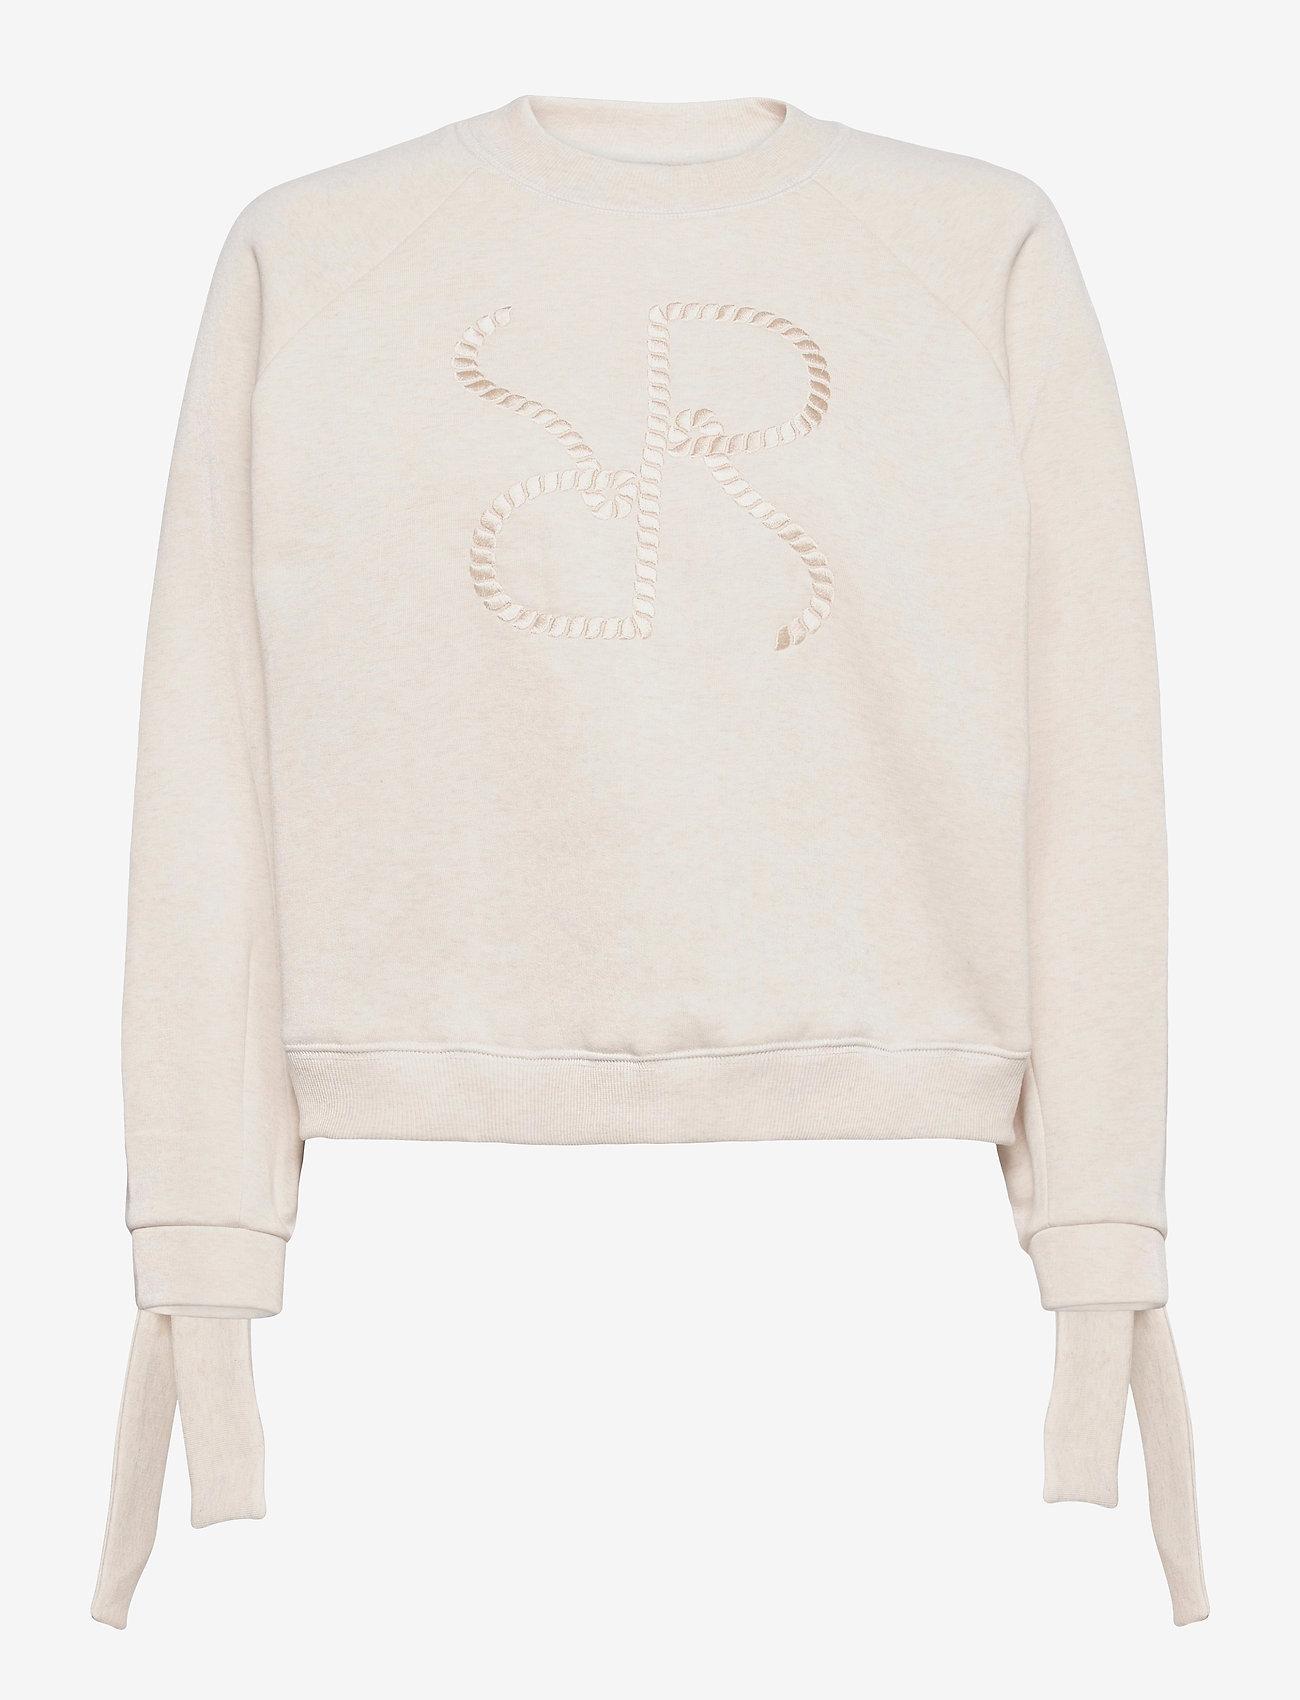 RODEBJER - RODEBJER ZORINA - sweatshirts & hættetrøjer - puffy white - 0